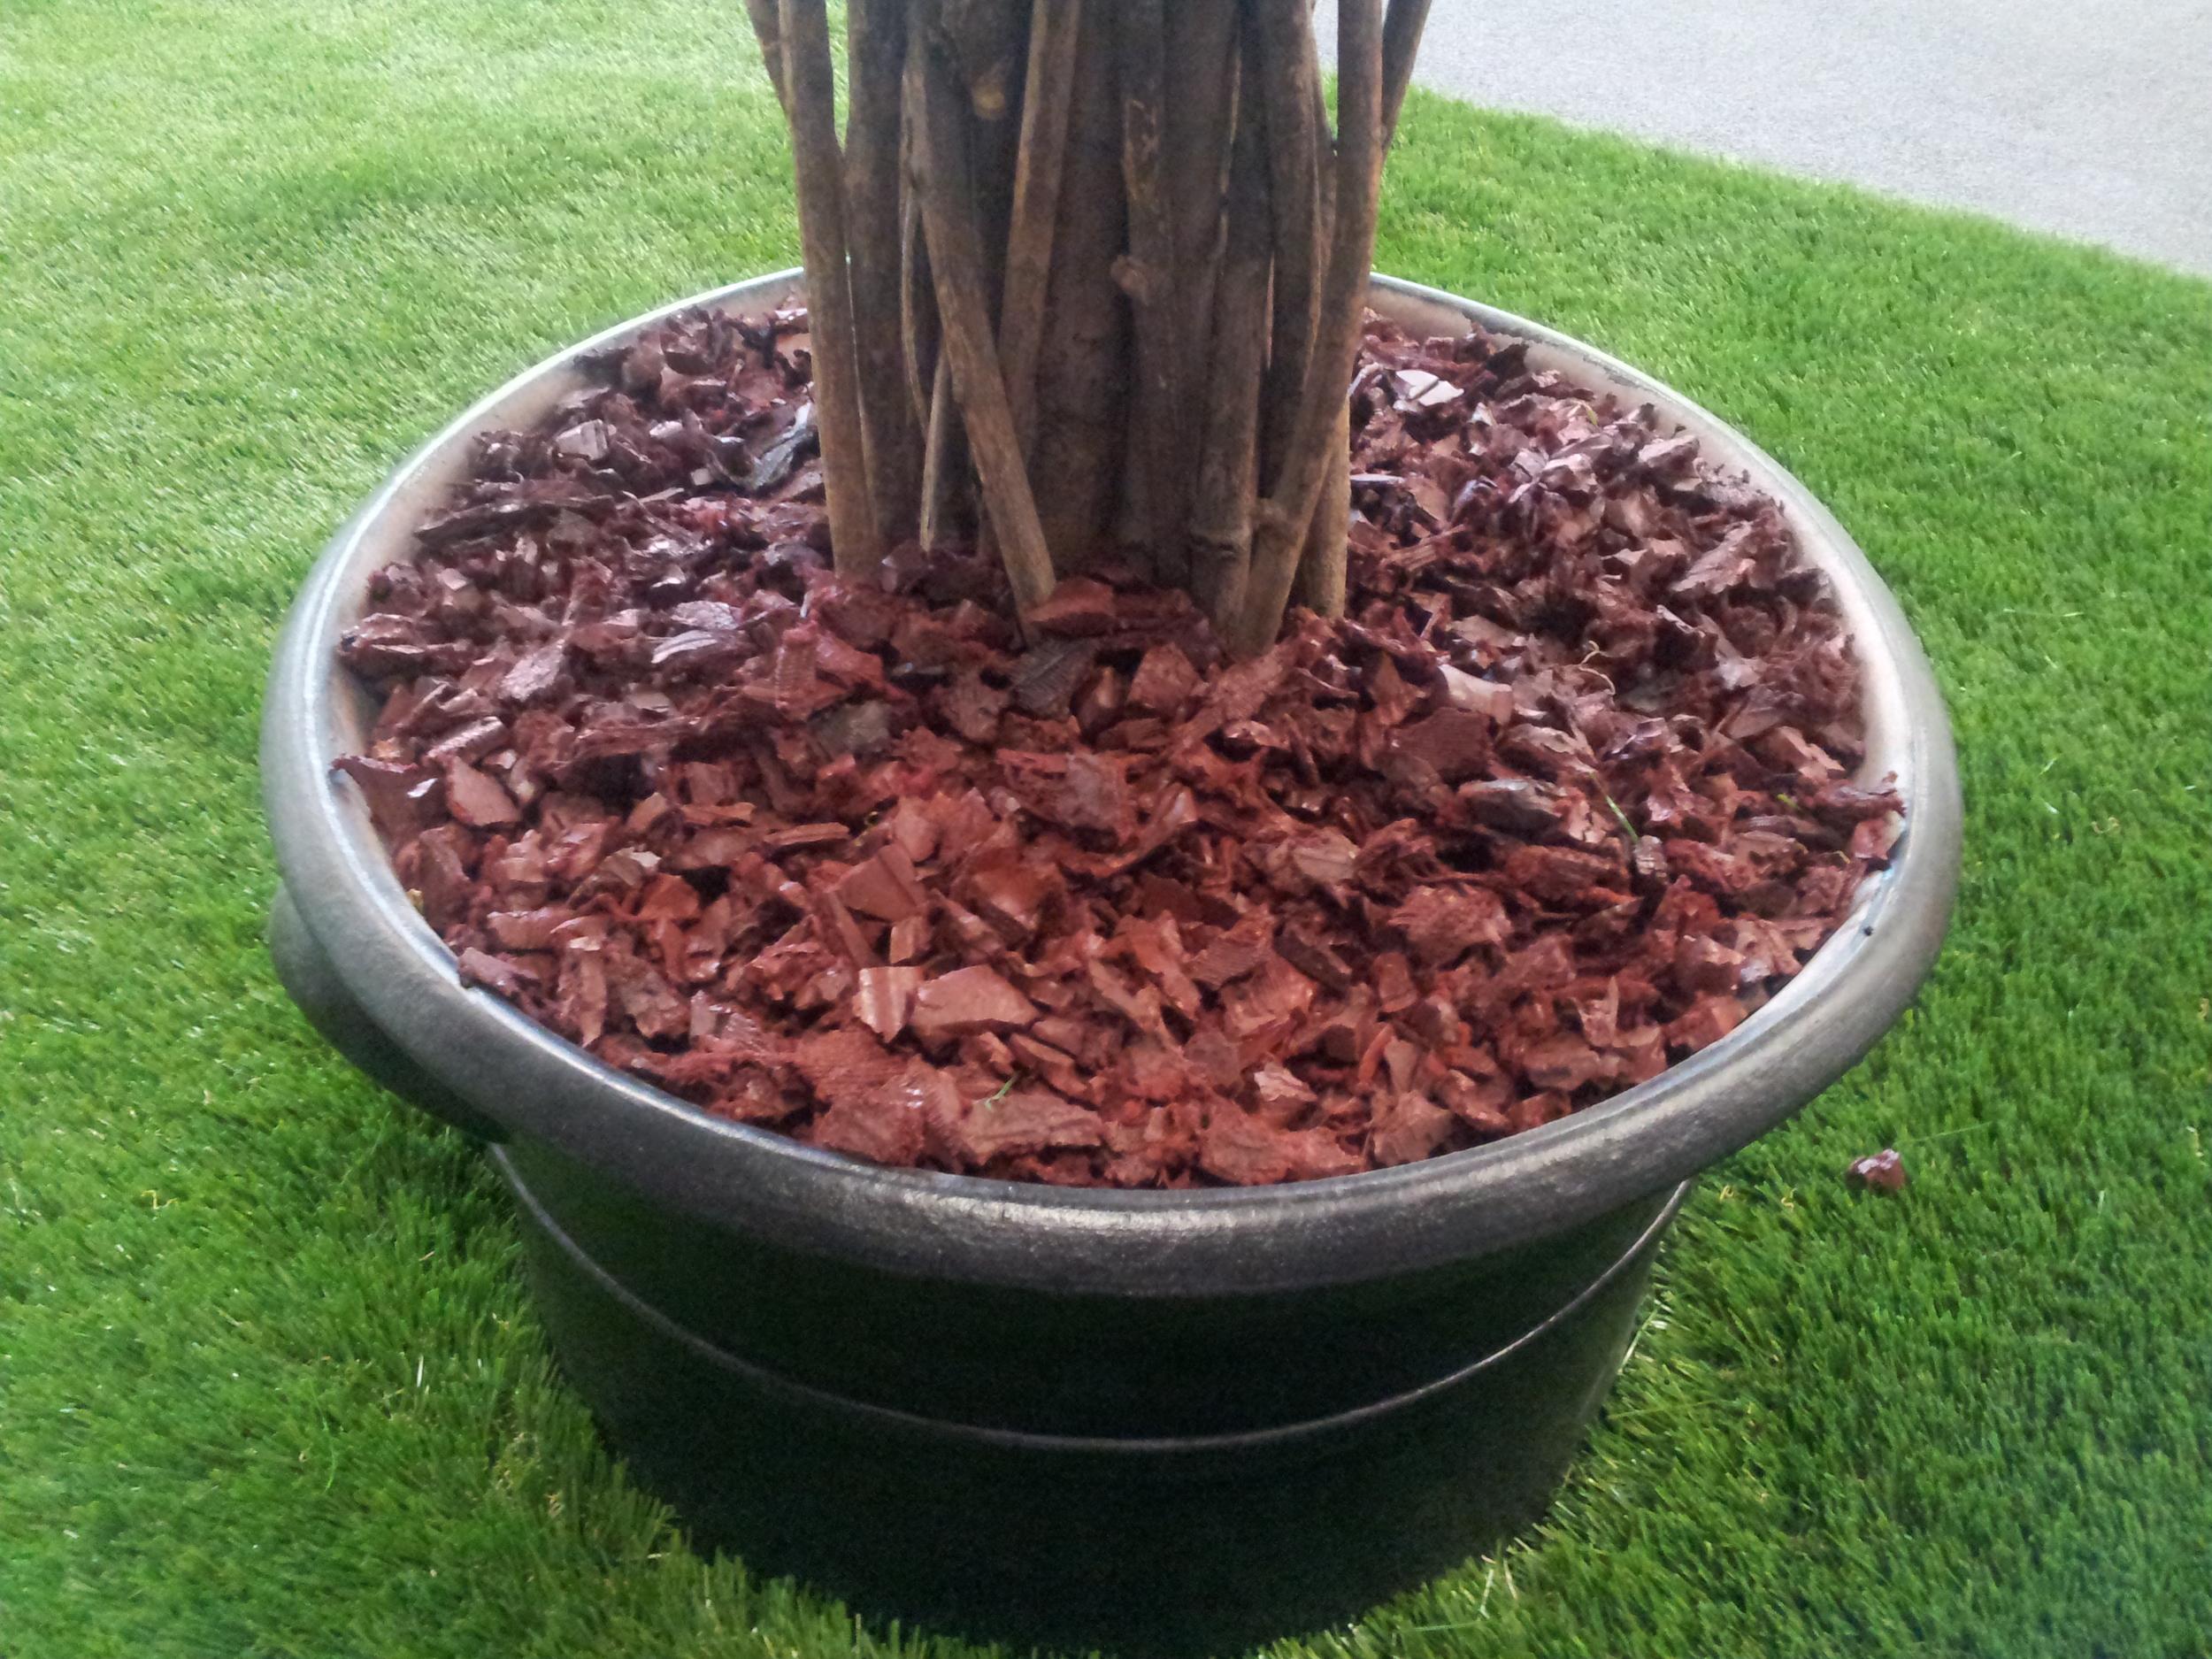 Redwood-Rubber-Mulch-1.jpg